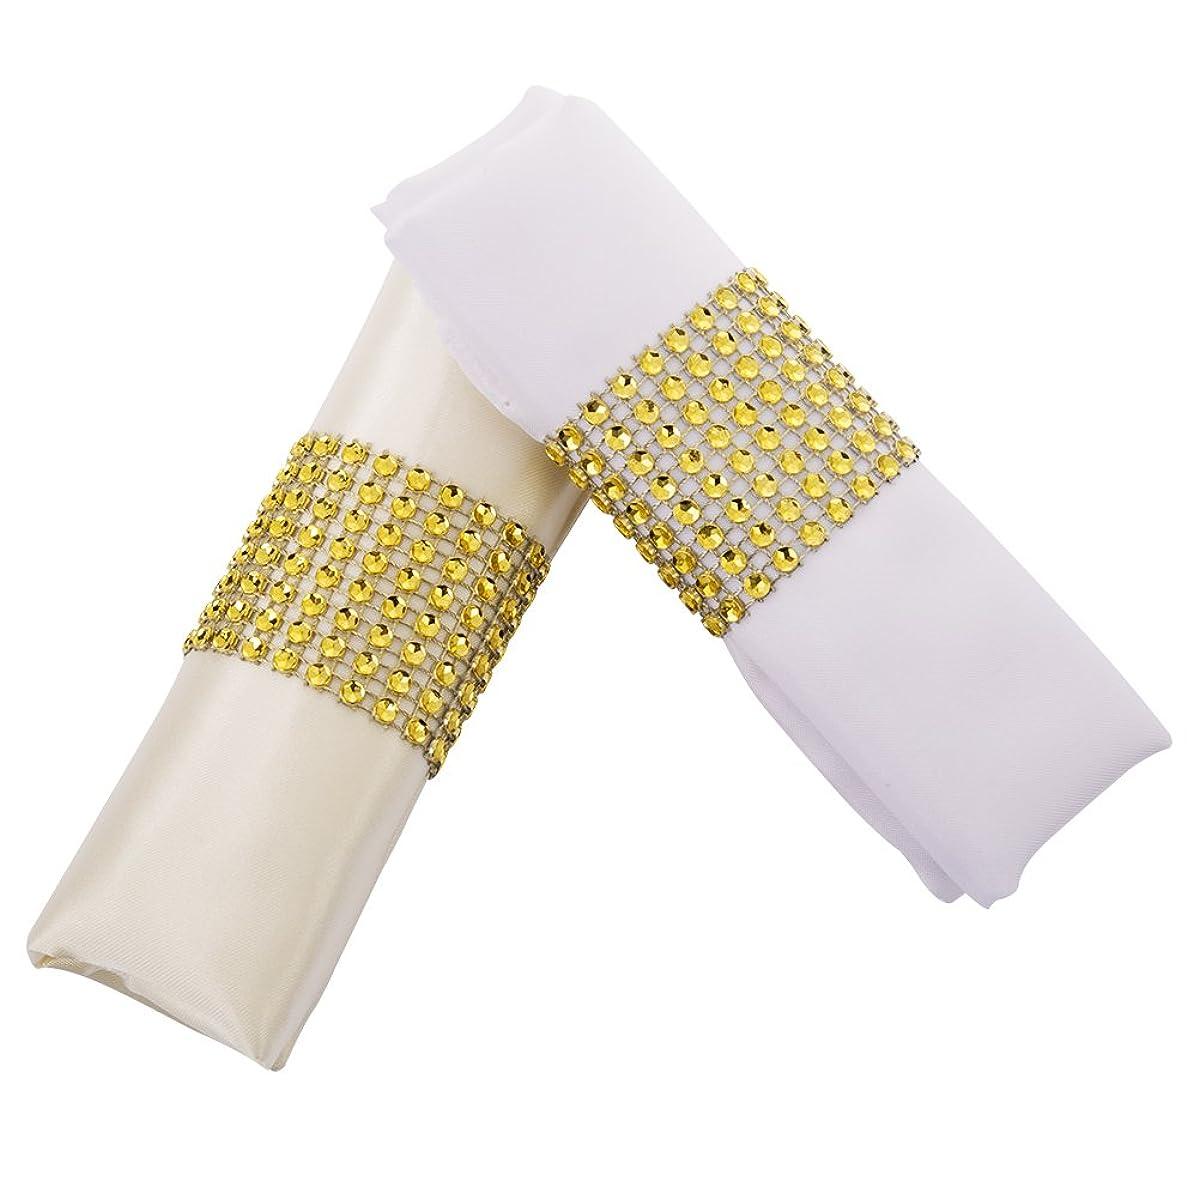 YumHome Napkin Rings Rhinestone Napkin Rings Adornment For Wedding Party (100 PCS, Gold)